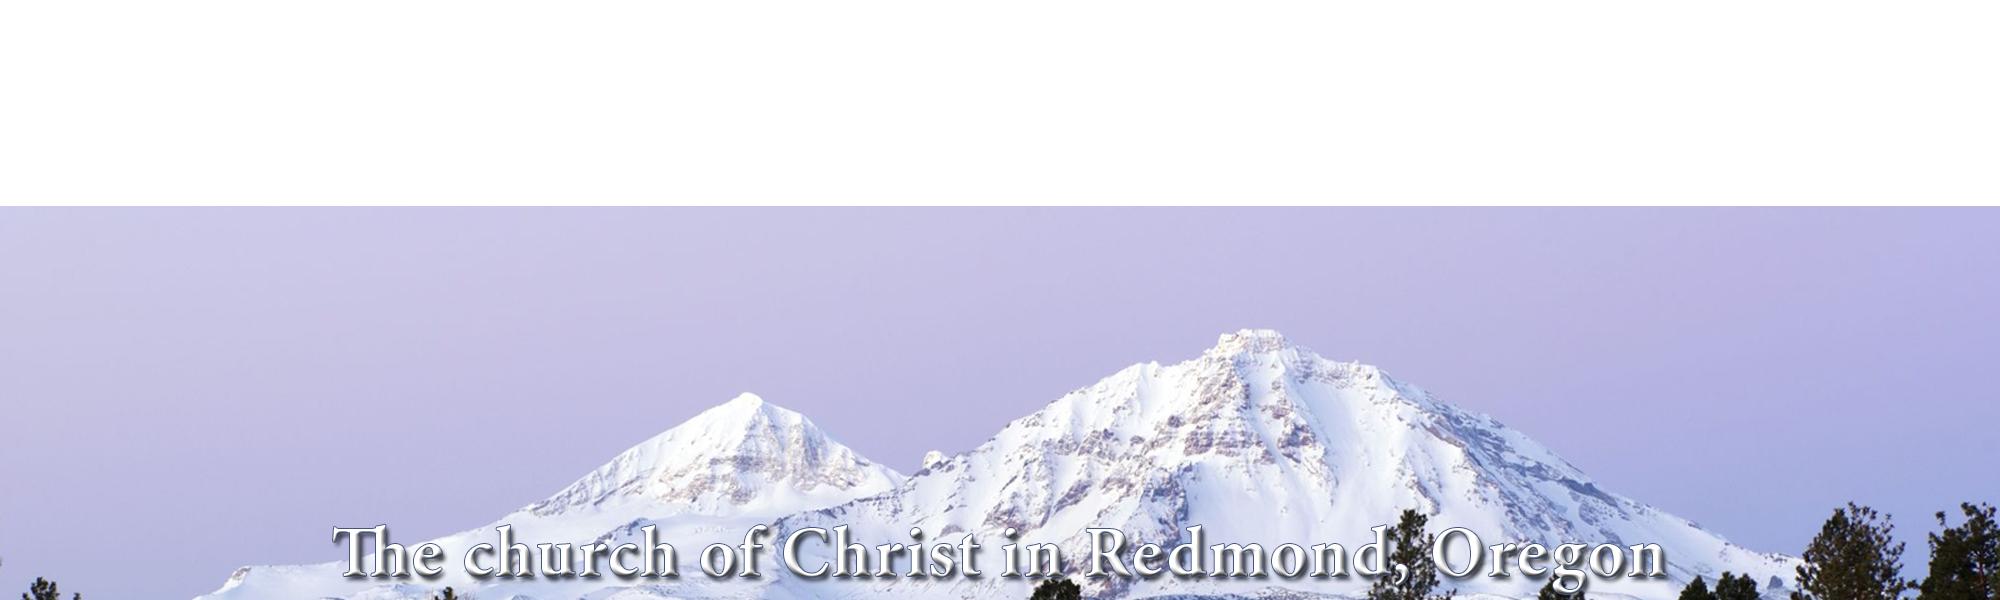 The church of Christ in Redmond, Oregon